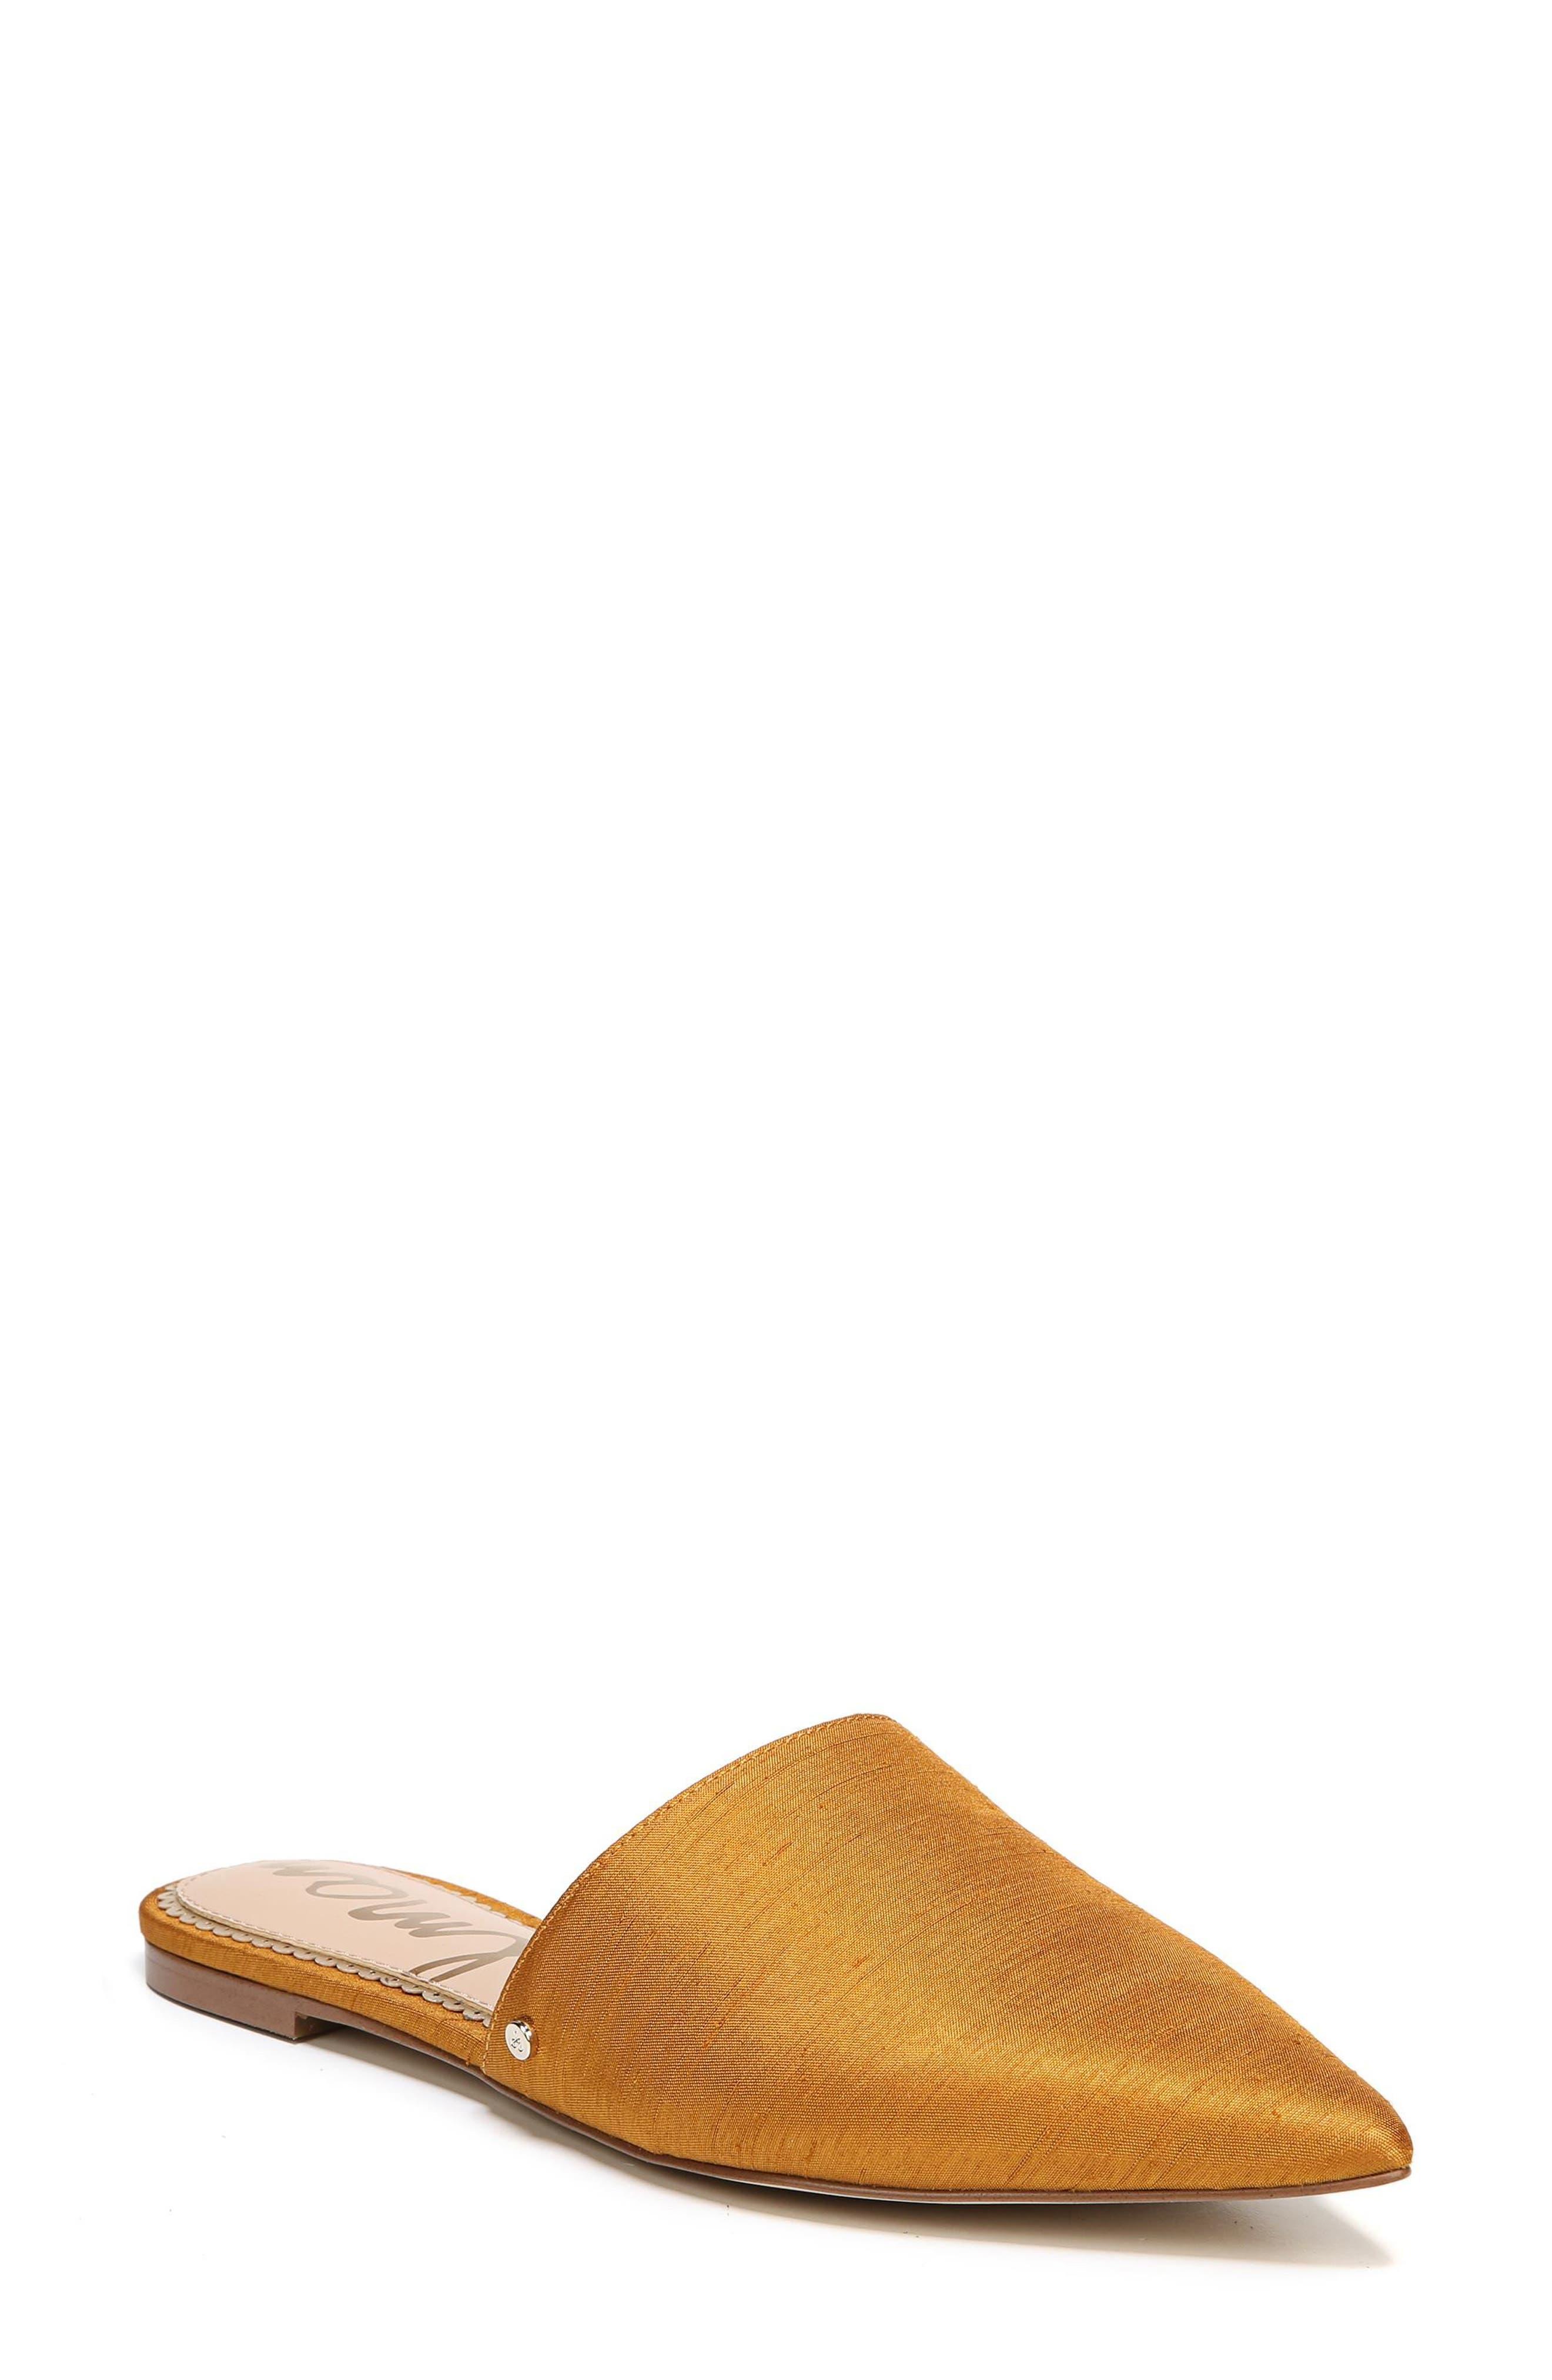 Rumi Genuine Calf Hair Slide,                             Main thumbnail 6, color,